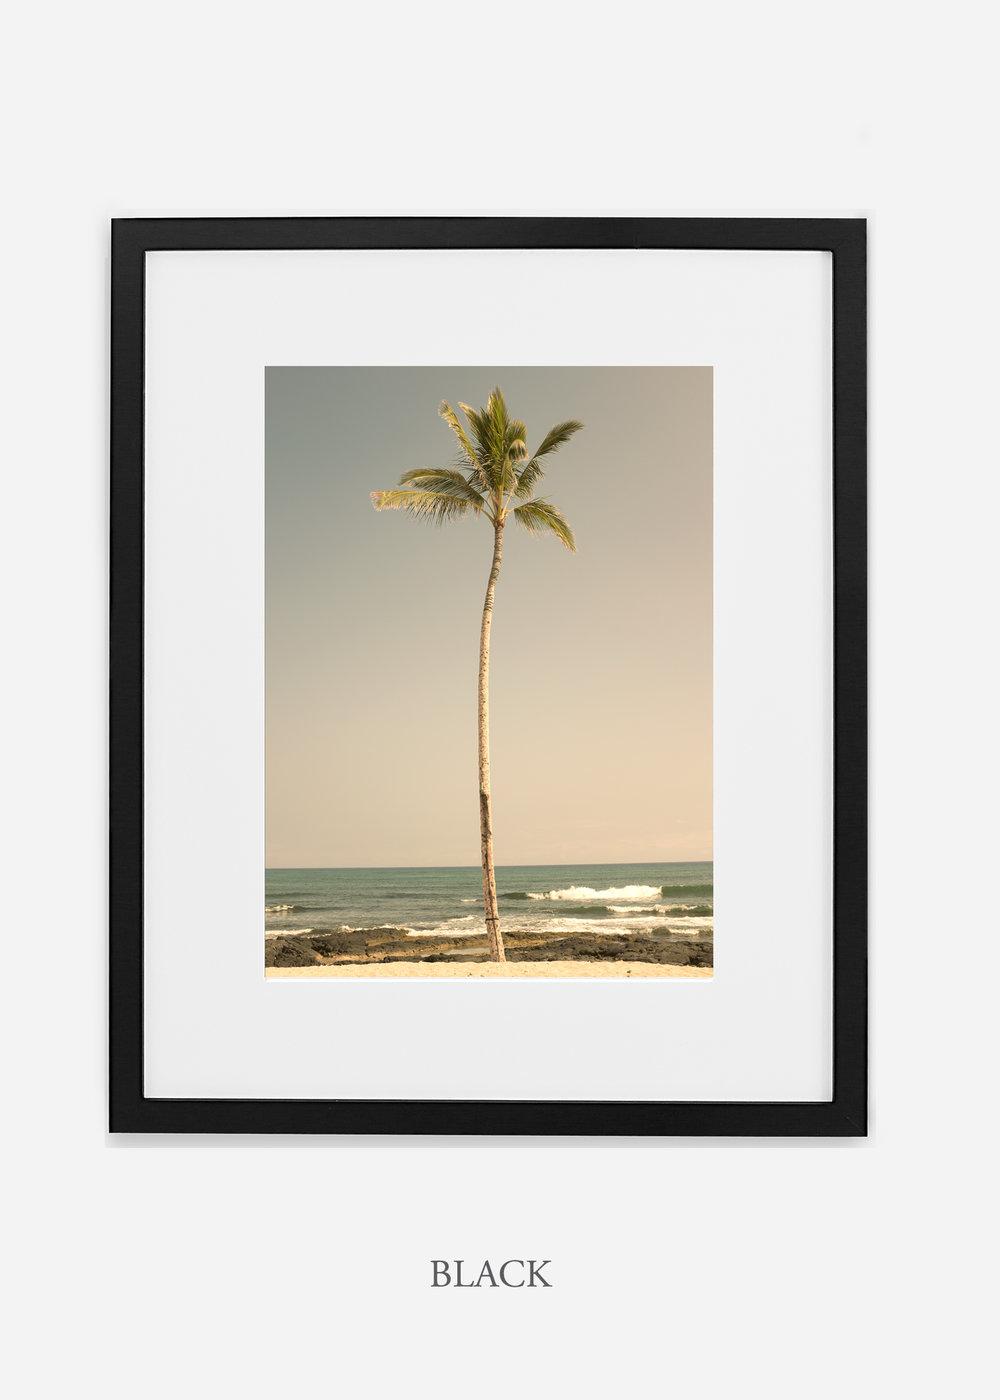 WilderCalifornia_PalmTree_No2_Art_Photography_interiordesign_blackframe.jpg